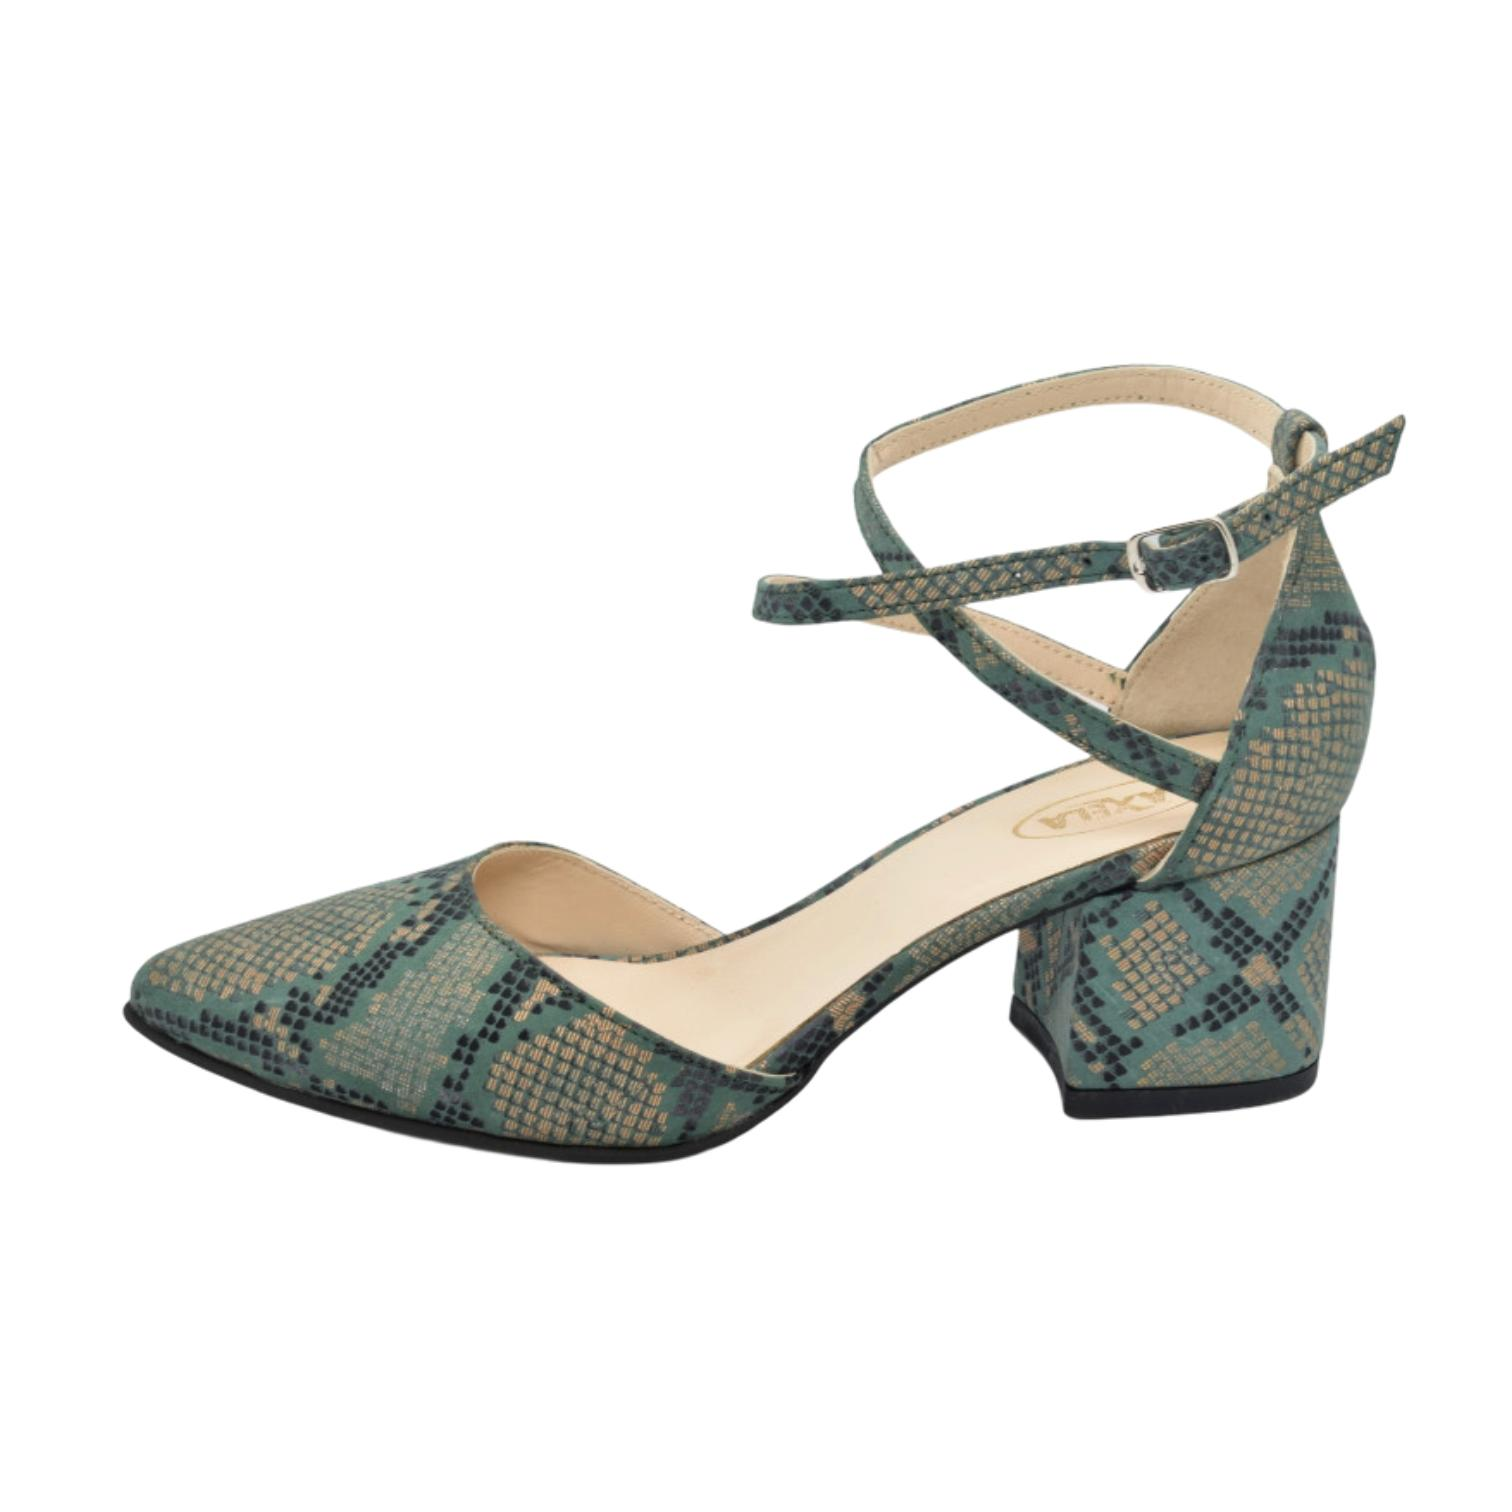 Pantofi decupati verzi cu imprimeu anaconda